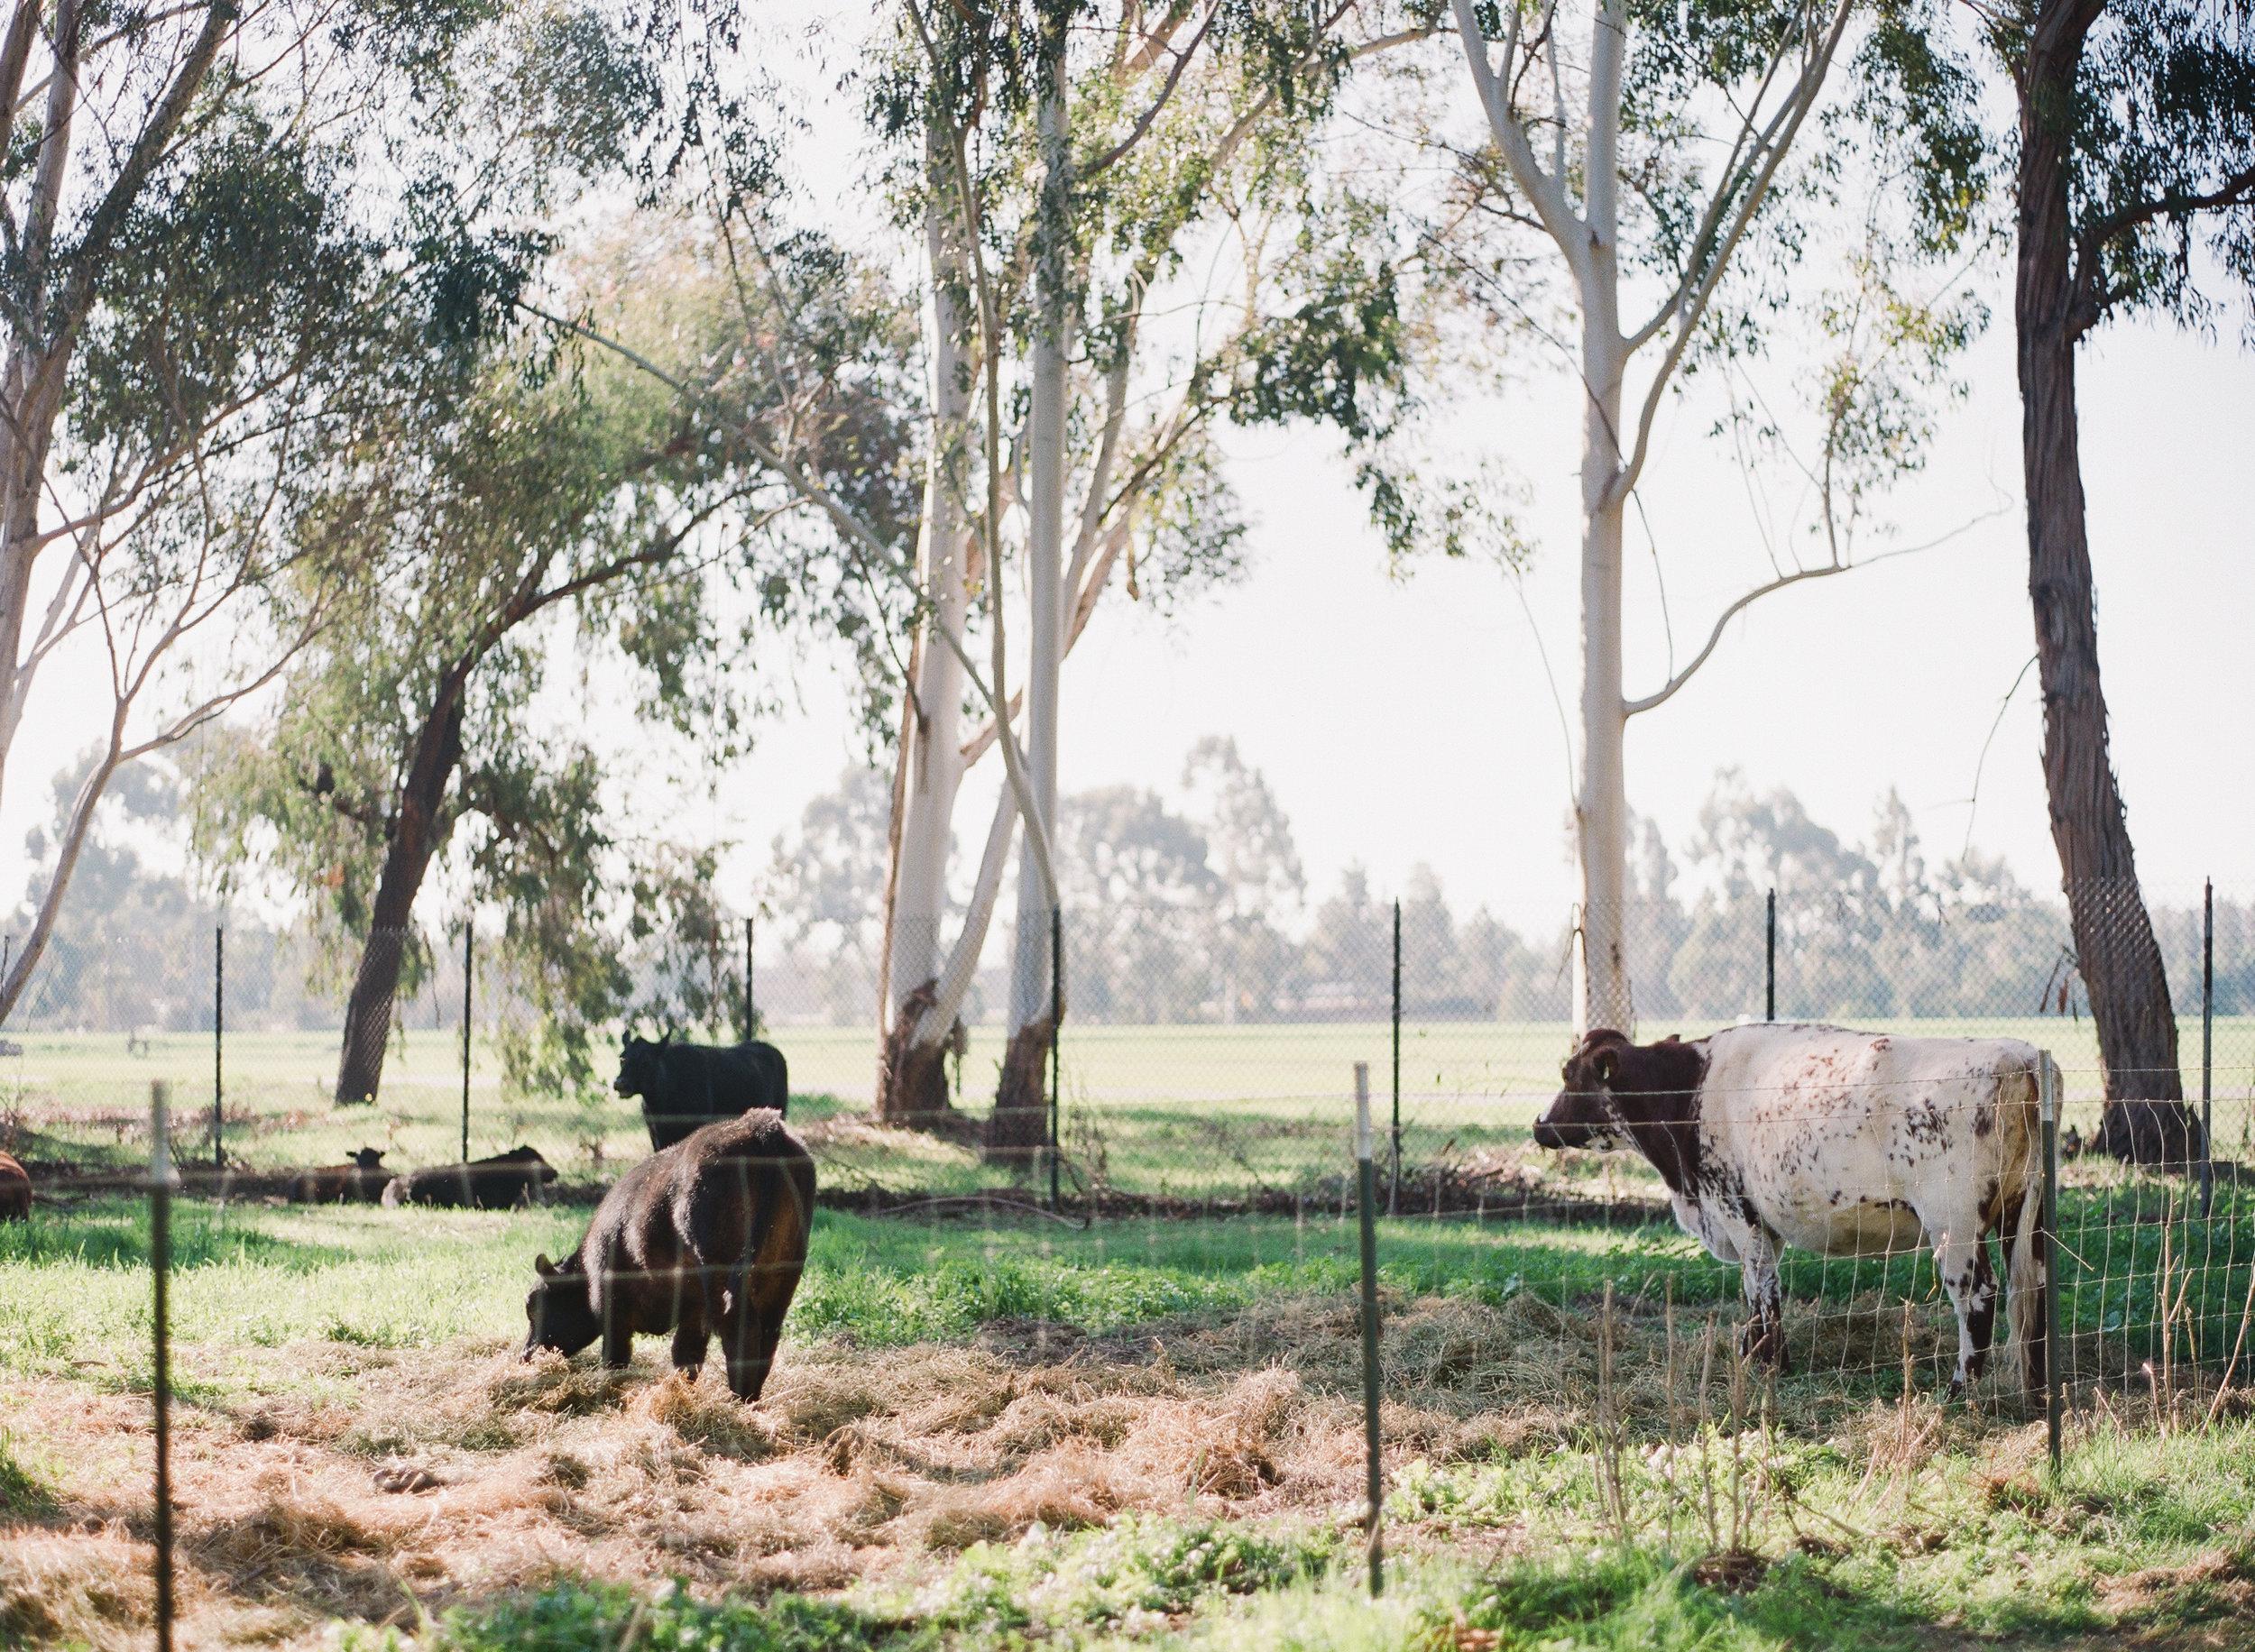 radostina_boseva_ardenwood_historic_farm_02